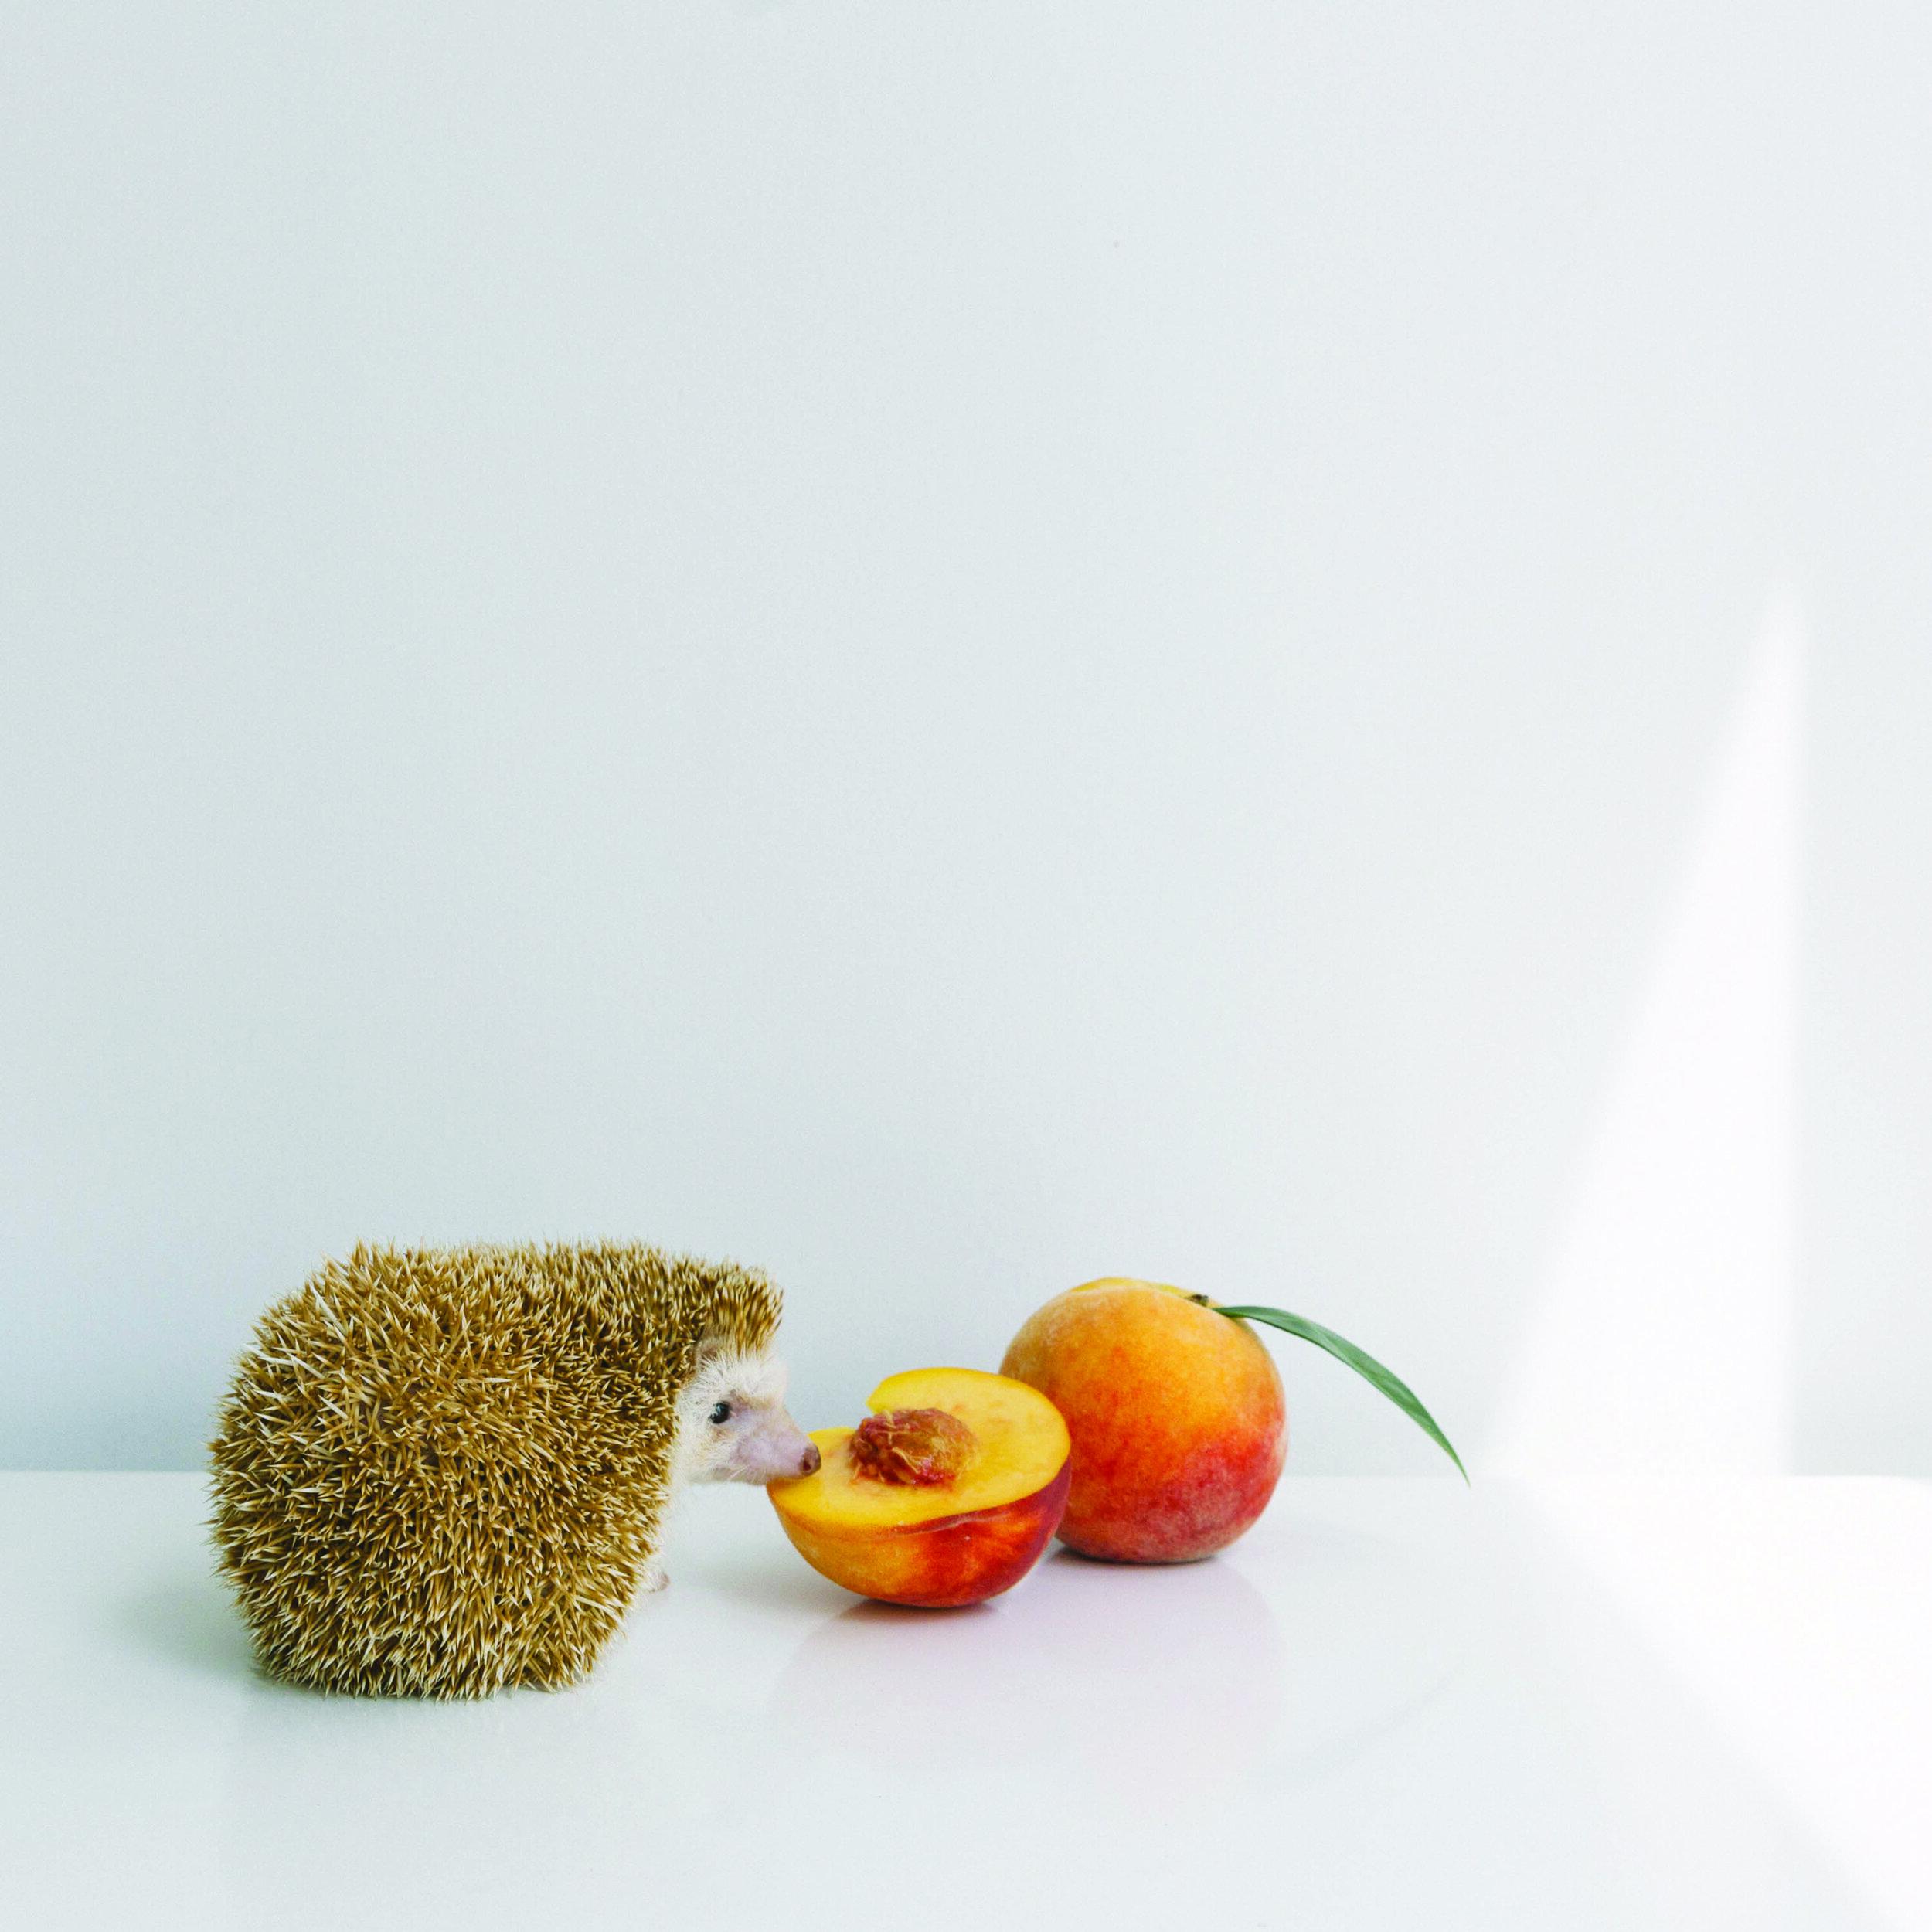 amelia_hedgehog_peach_postcard.jpg